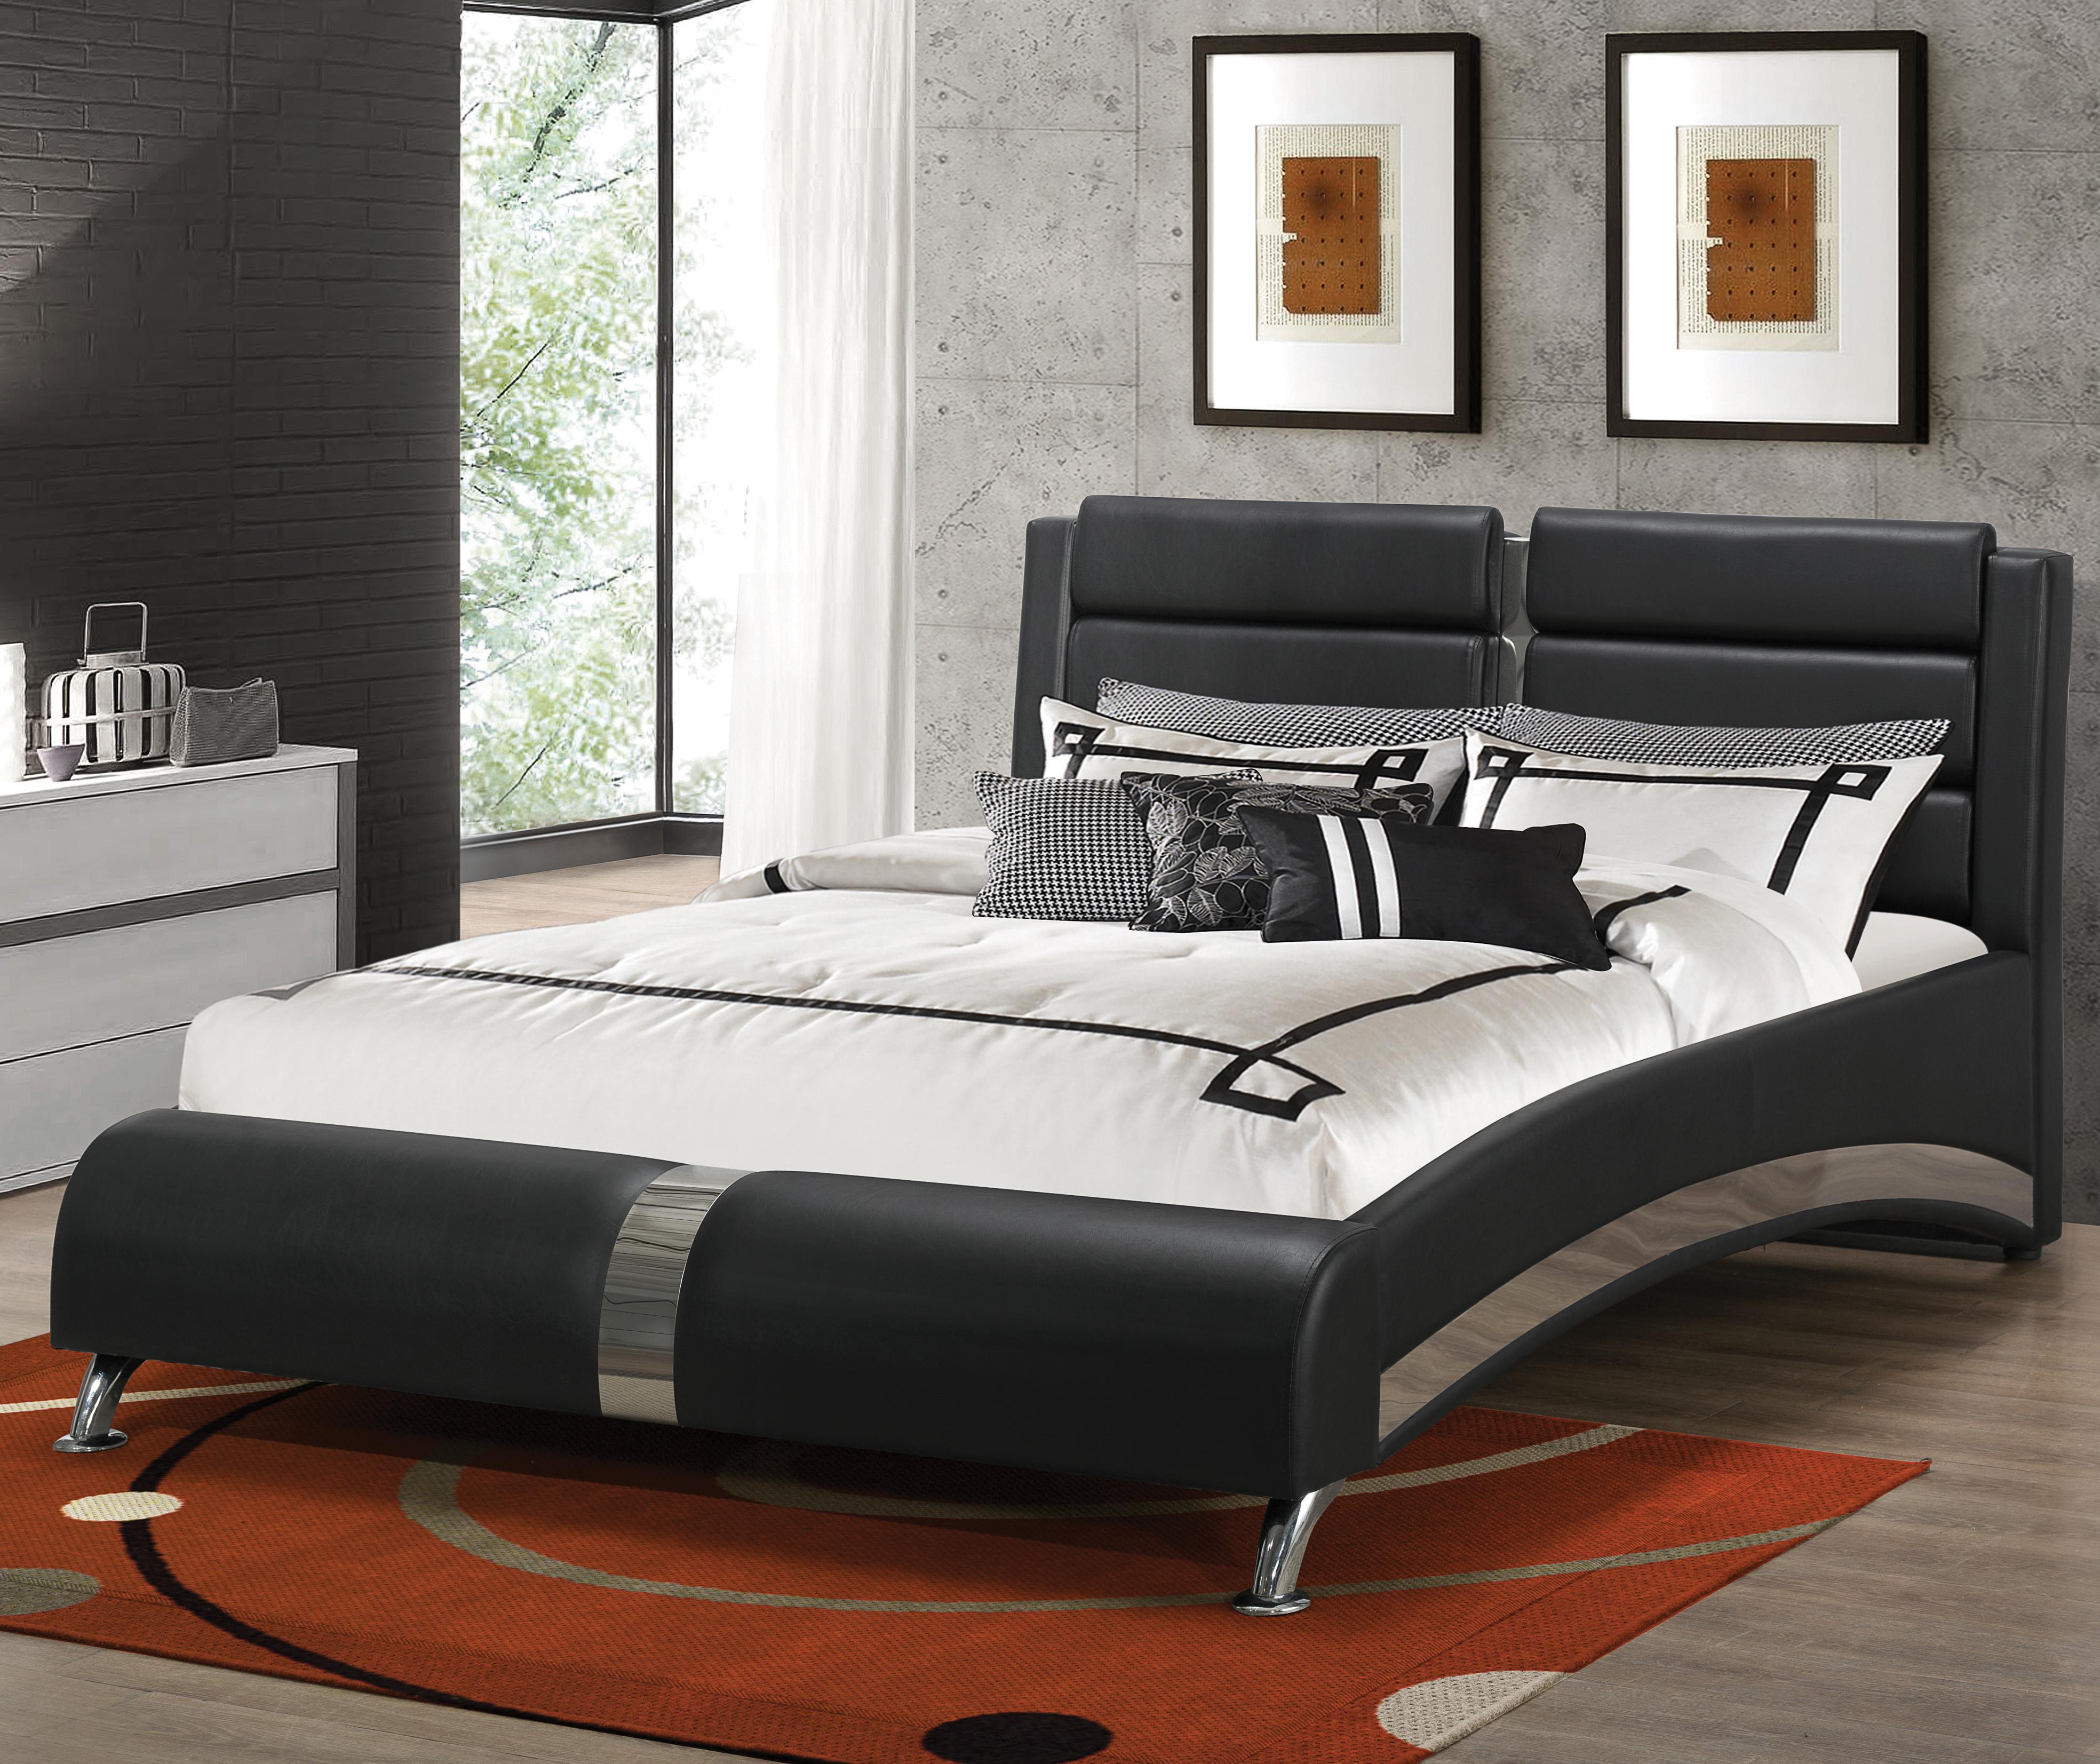 Upholstered Beds Queen Jeremaine Upholstered Bed by Coaster at Pedigo Furniture